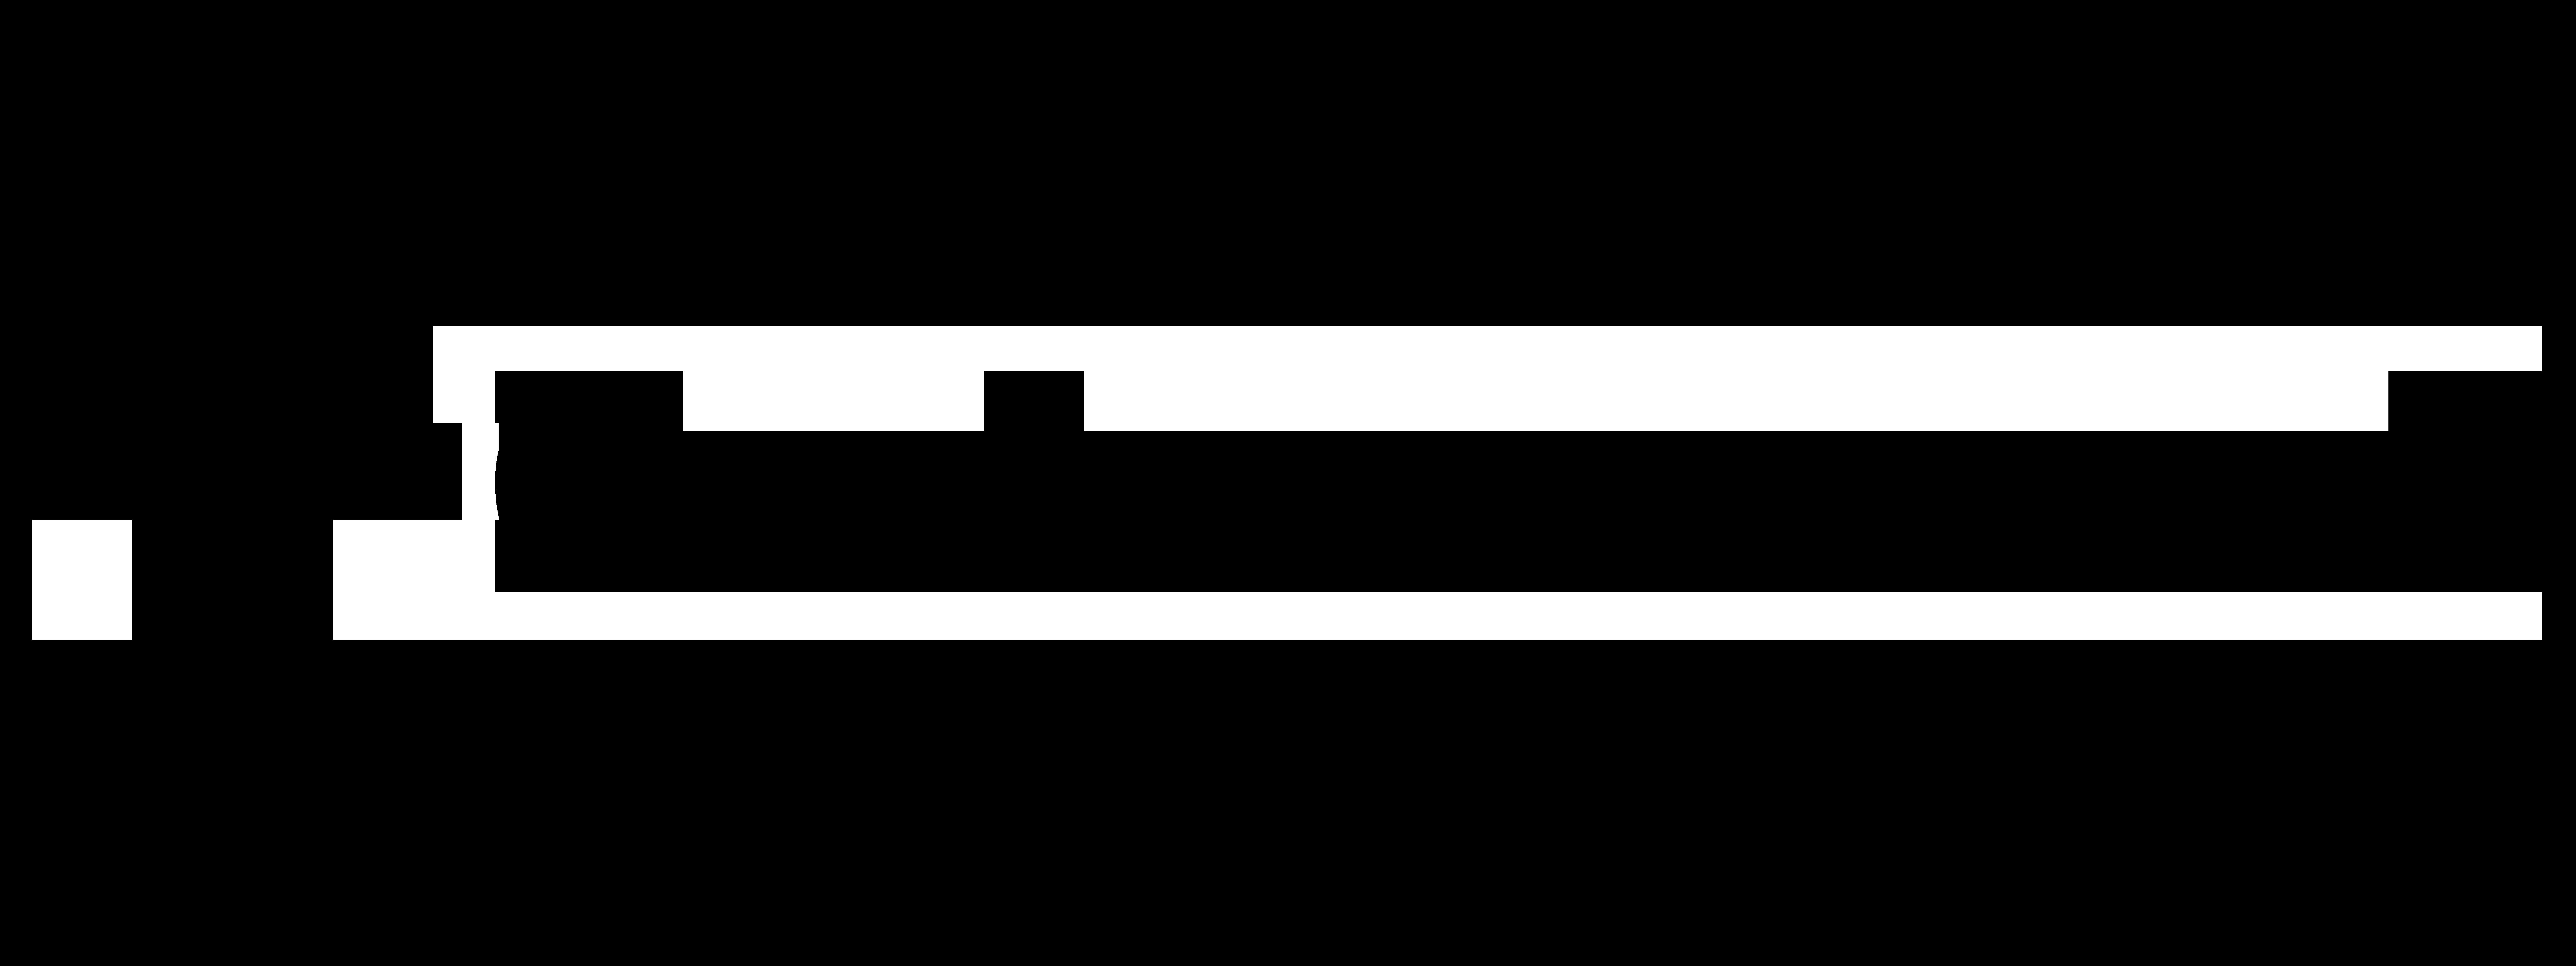 Contournement logo